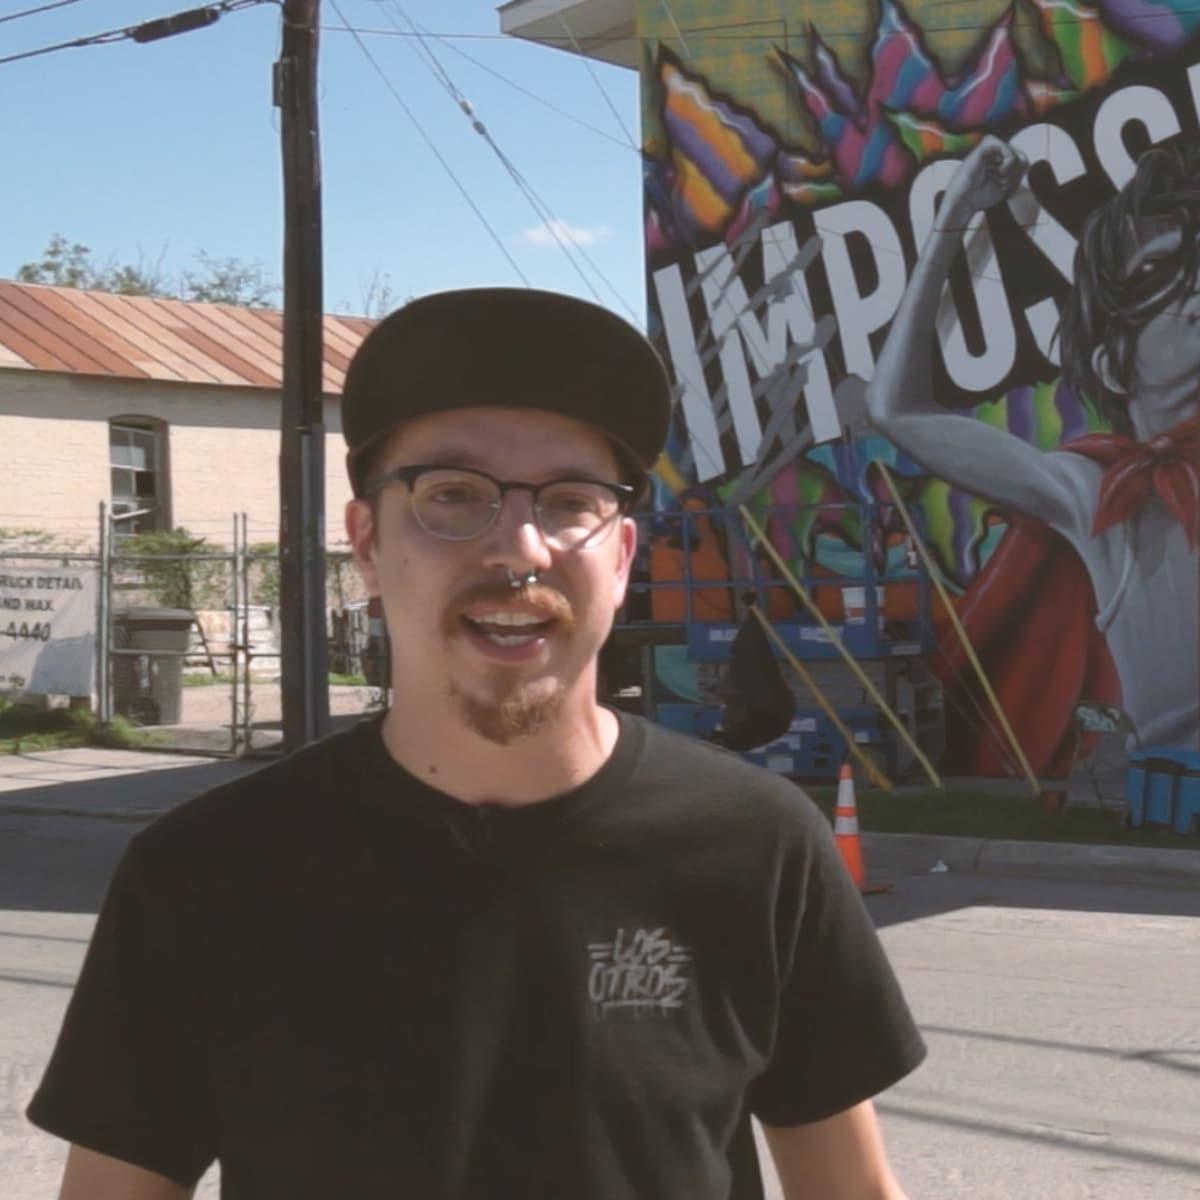 San Antonio Frost Opt for Optimism mural